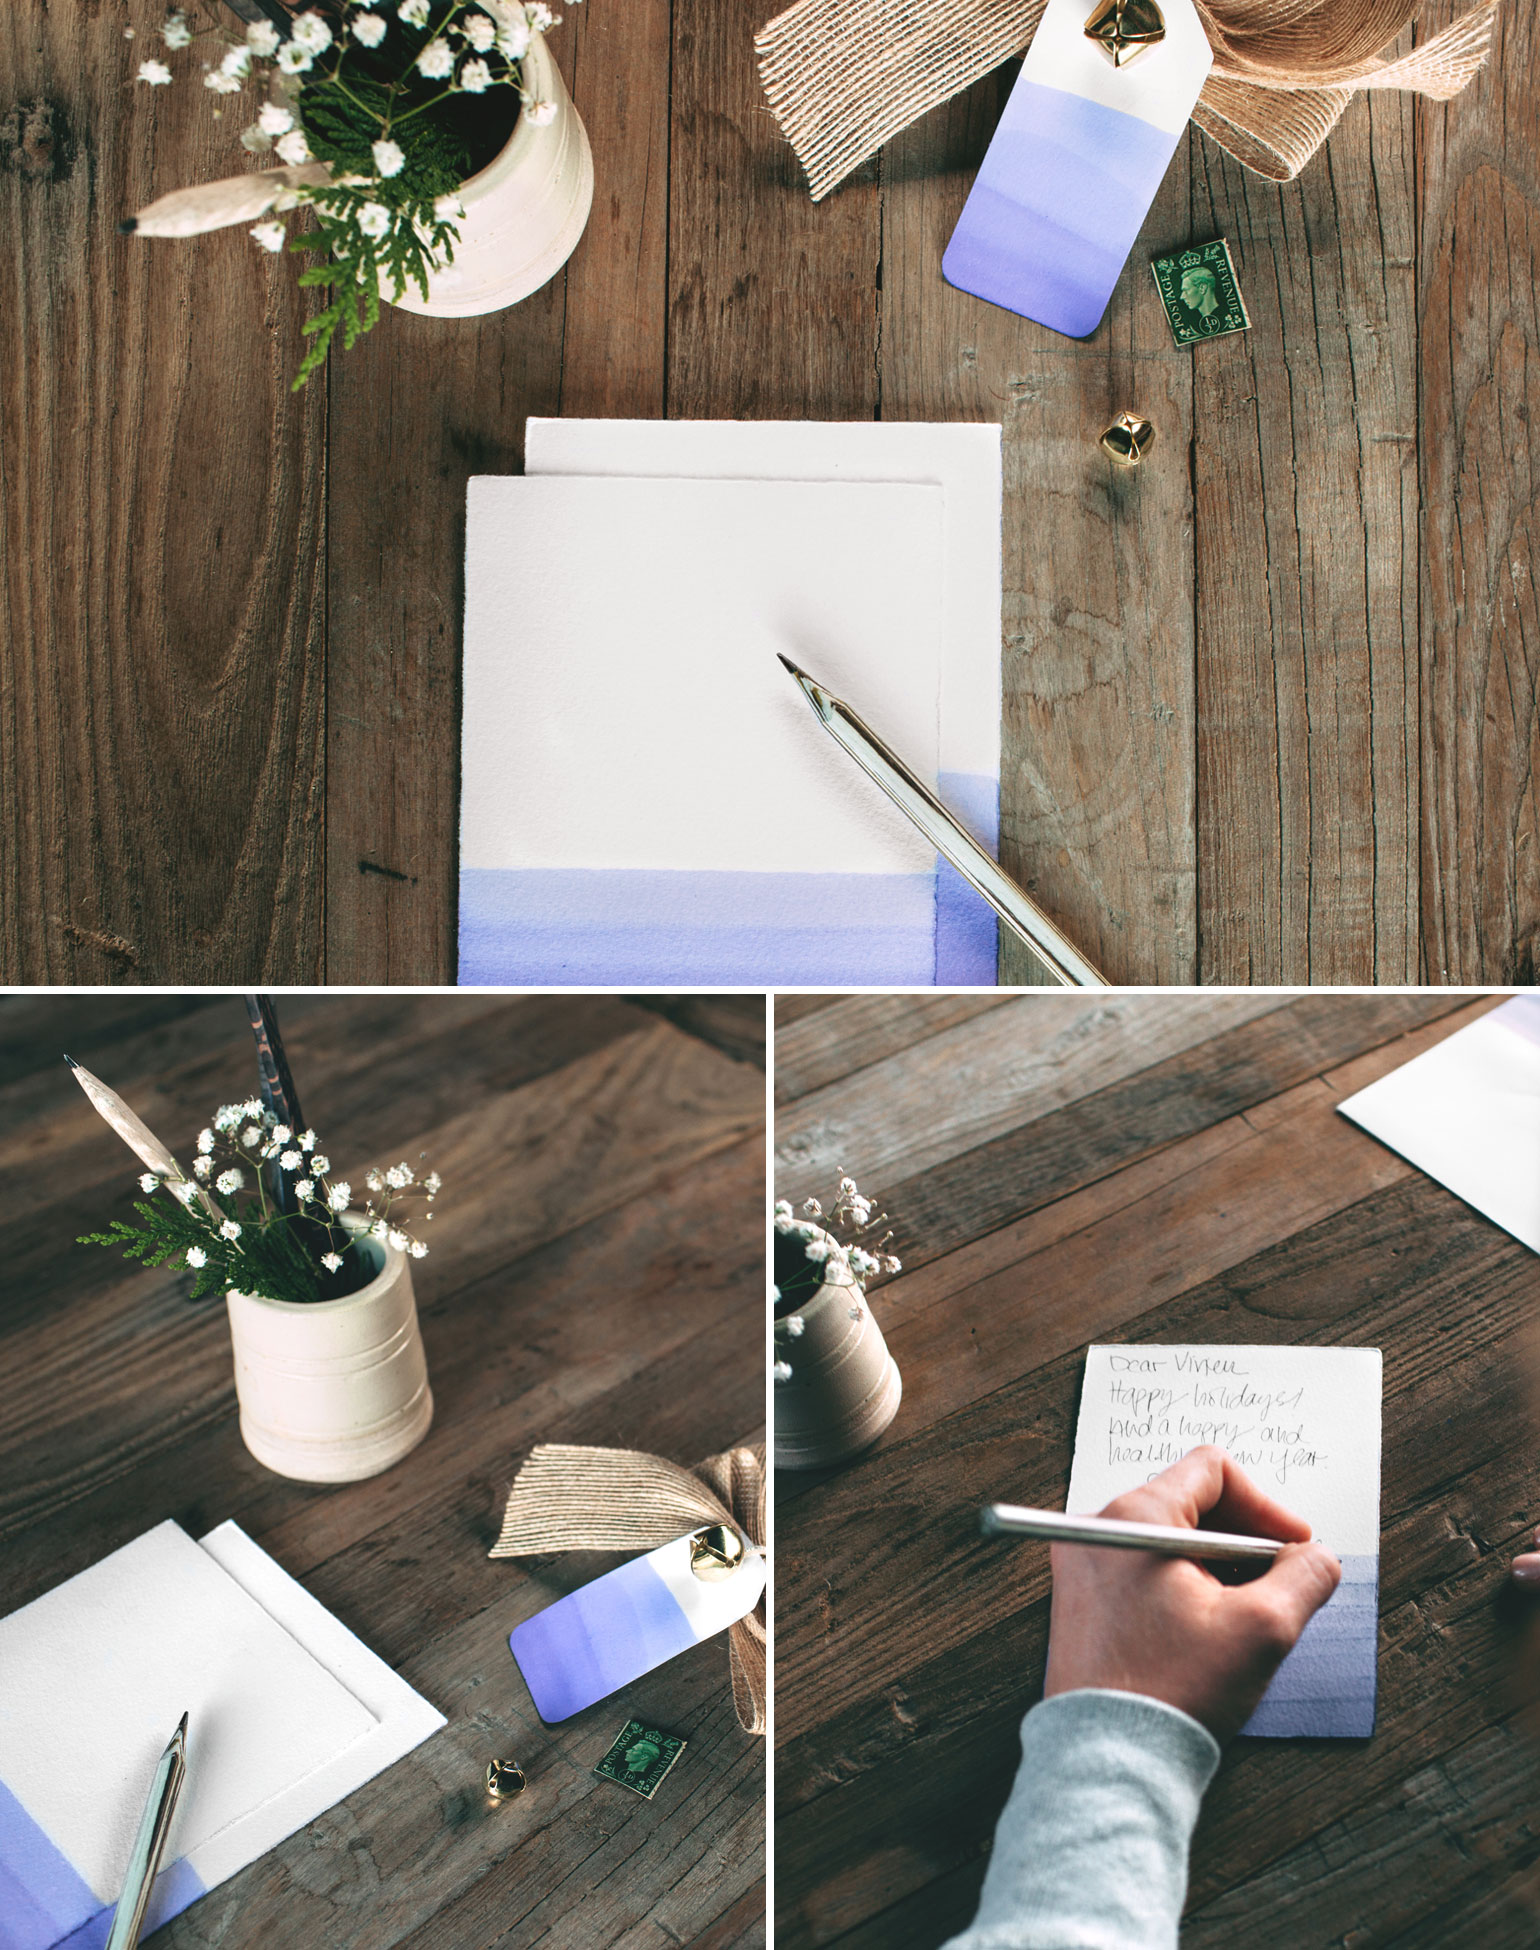 DIY-Dip-Dye-Stationery-Ziploc-Brand